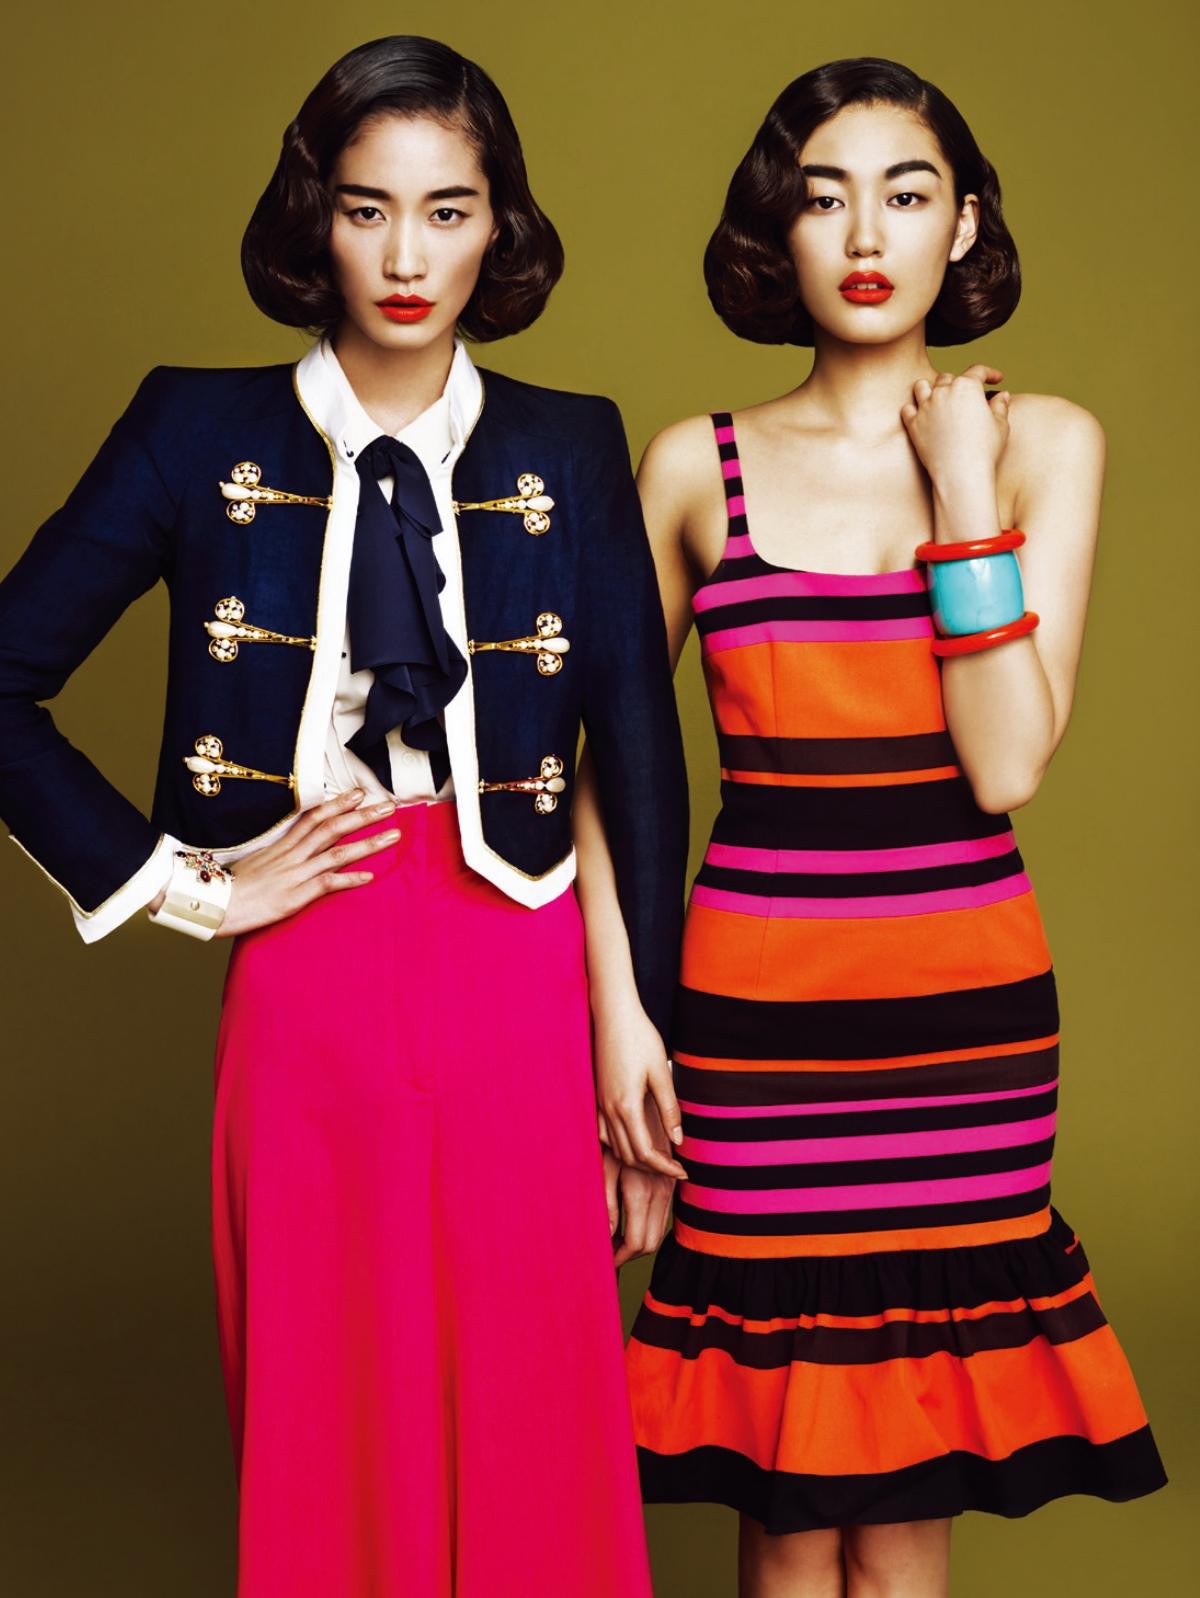 http://1.bp.blogspot.com/-J1_6Uv_Webw/TVfK0gVlf_I/AAAAAAAAHjs/hulW5dS-oLQ/s1600/Hye-Yeon_Han%252C_Sera_Park_%2526_Jun_Young_Par4k_by_Kim_Yeongjun_%2528Splash_of_Colors_-_Harper___%2527s_Bazaar_Korea.jpg